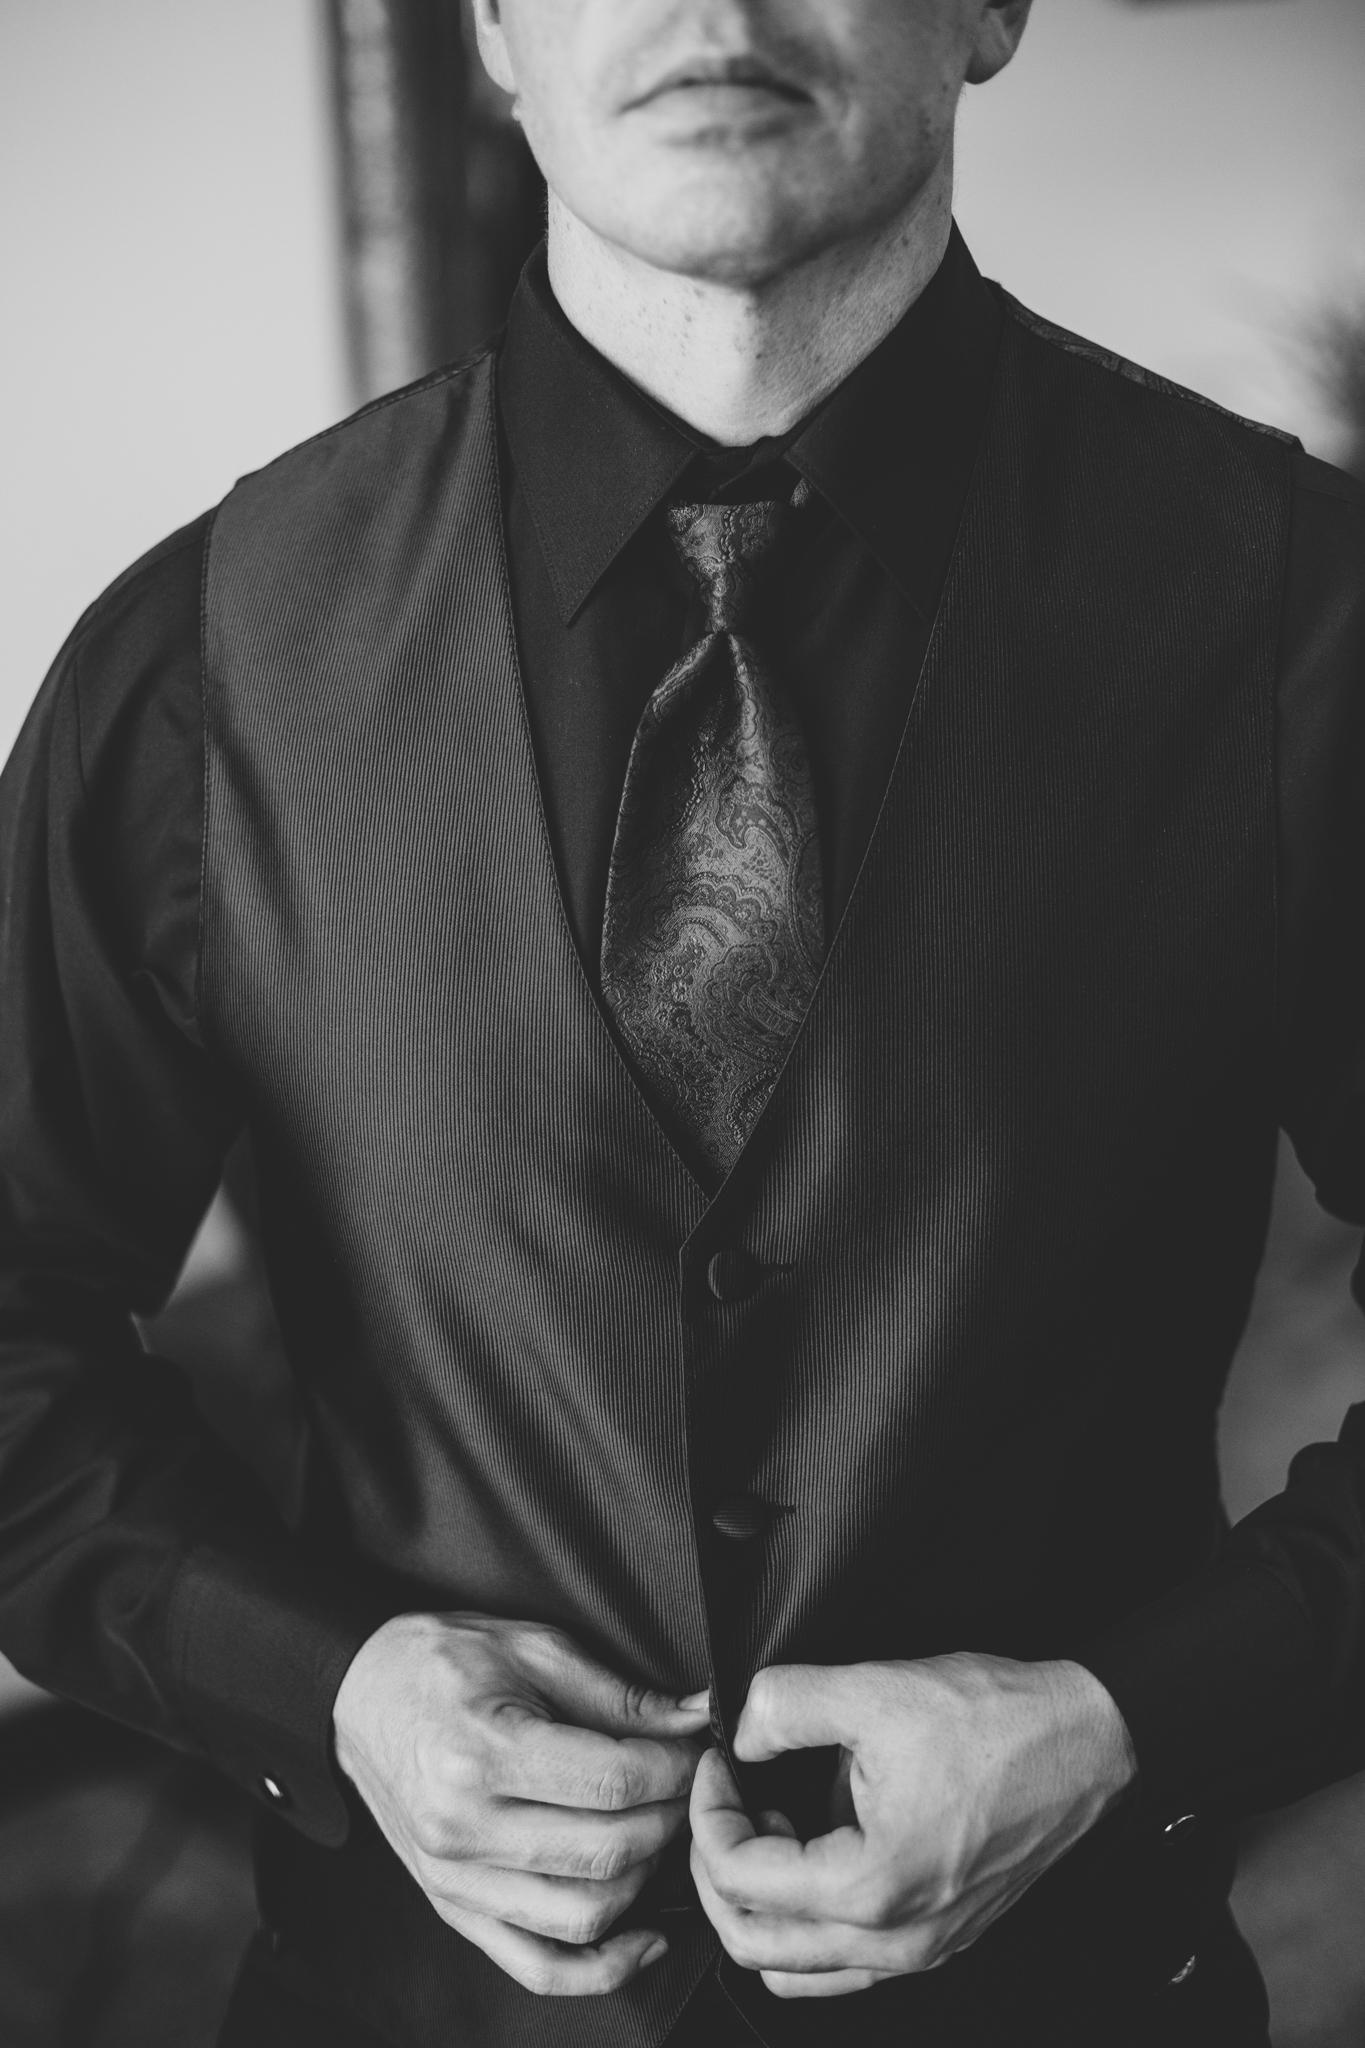 phoenix wedding photographer bw groom putting vest on mj